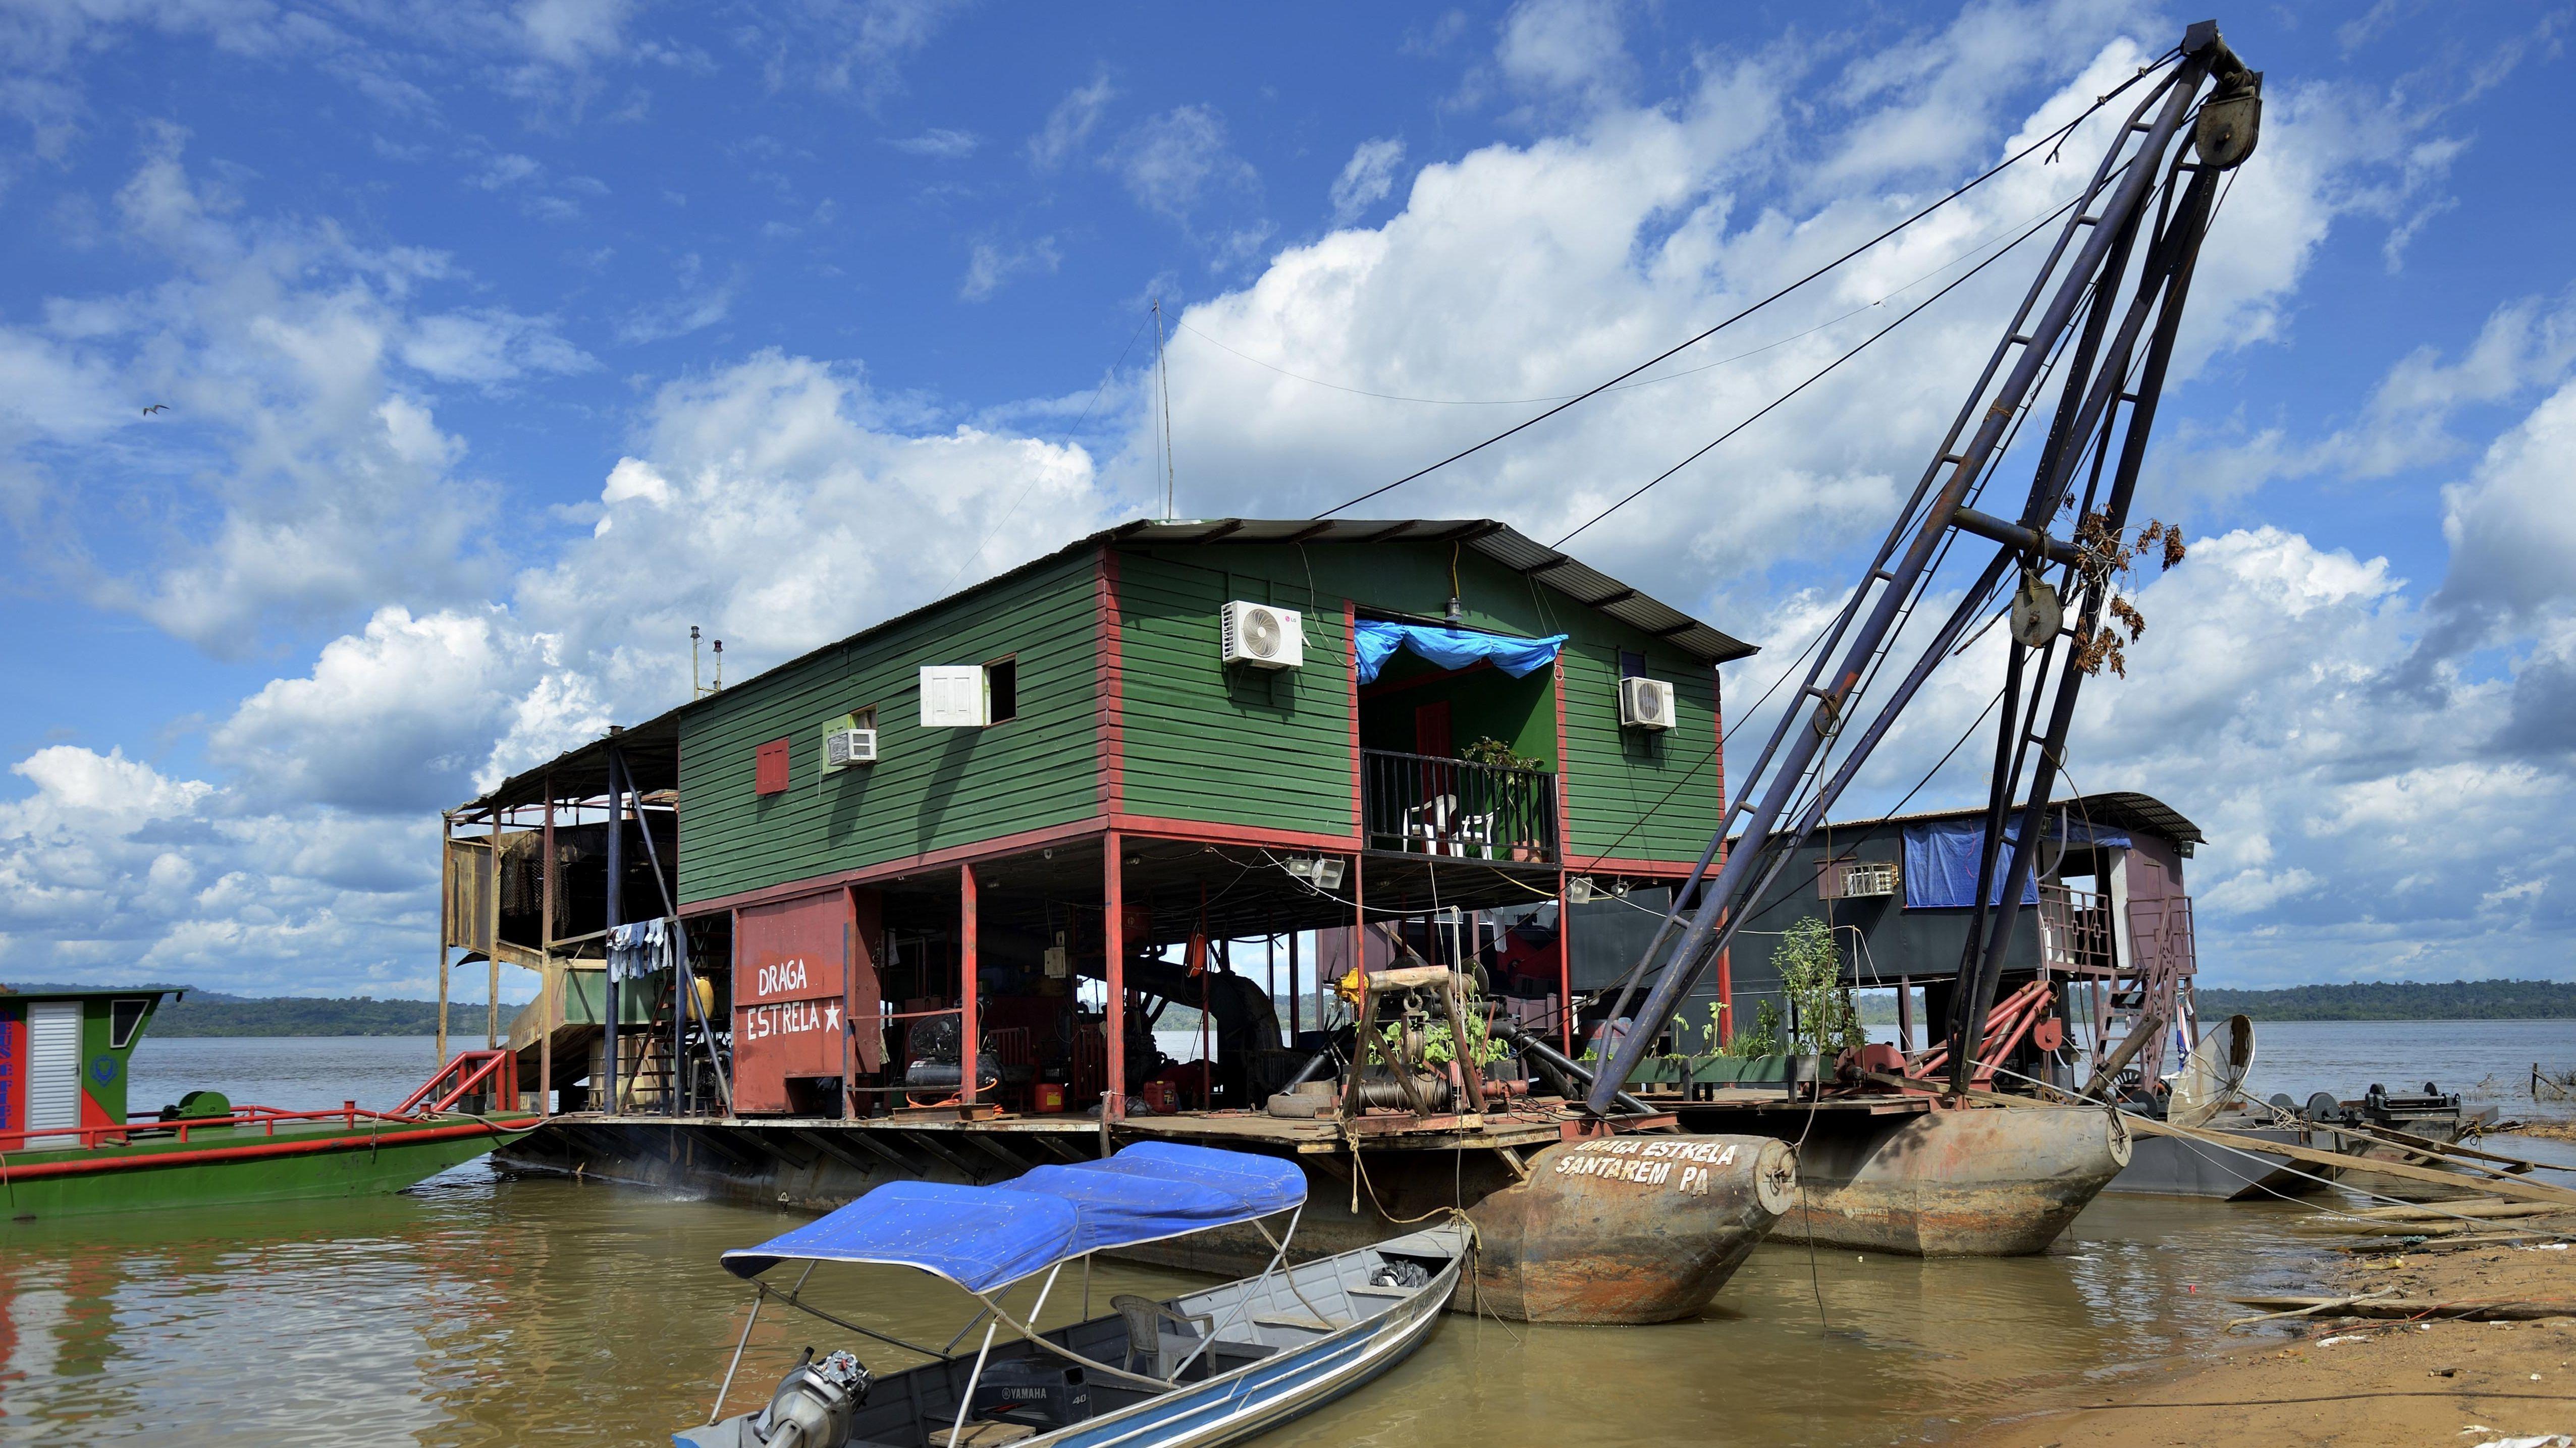 Floß von Garimpeiros am Fluß Rio Tapajos im Amazonas-Regenwald.